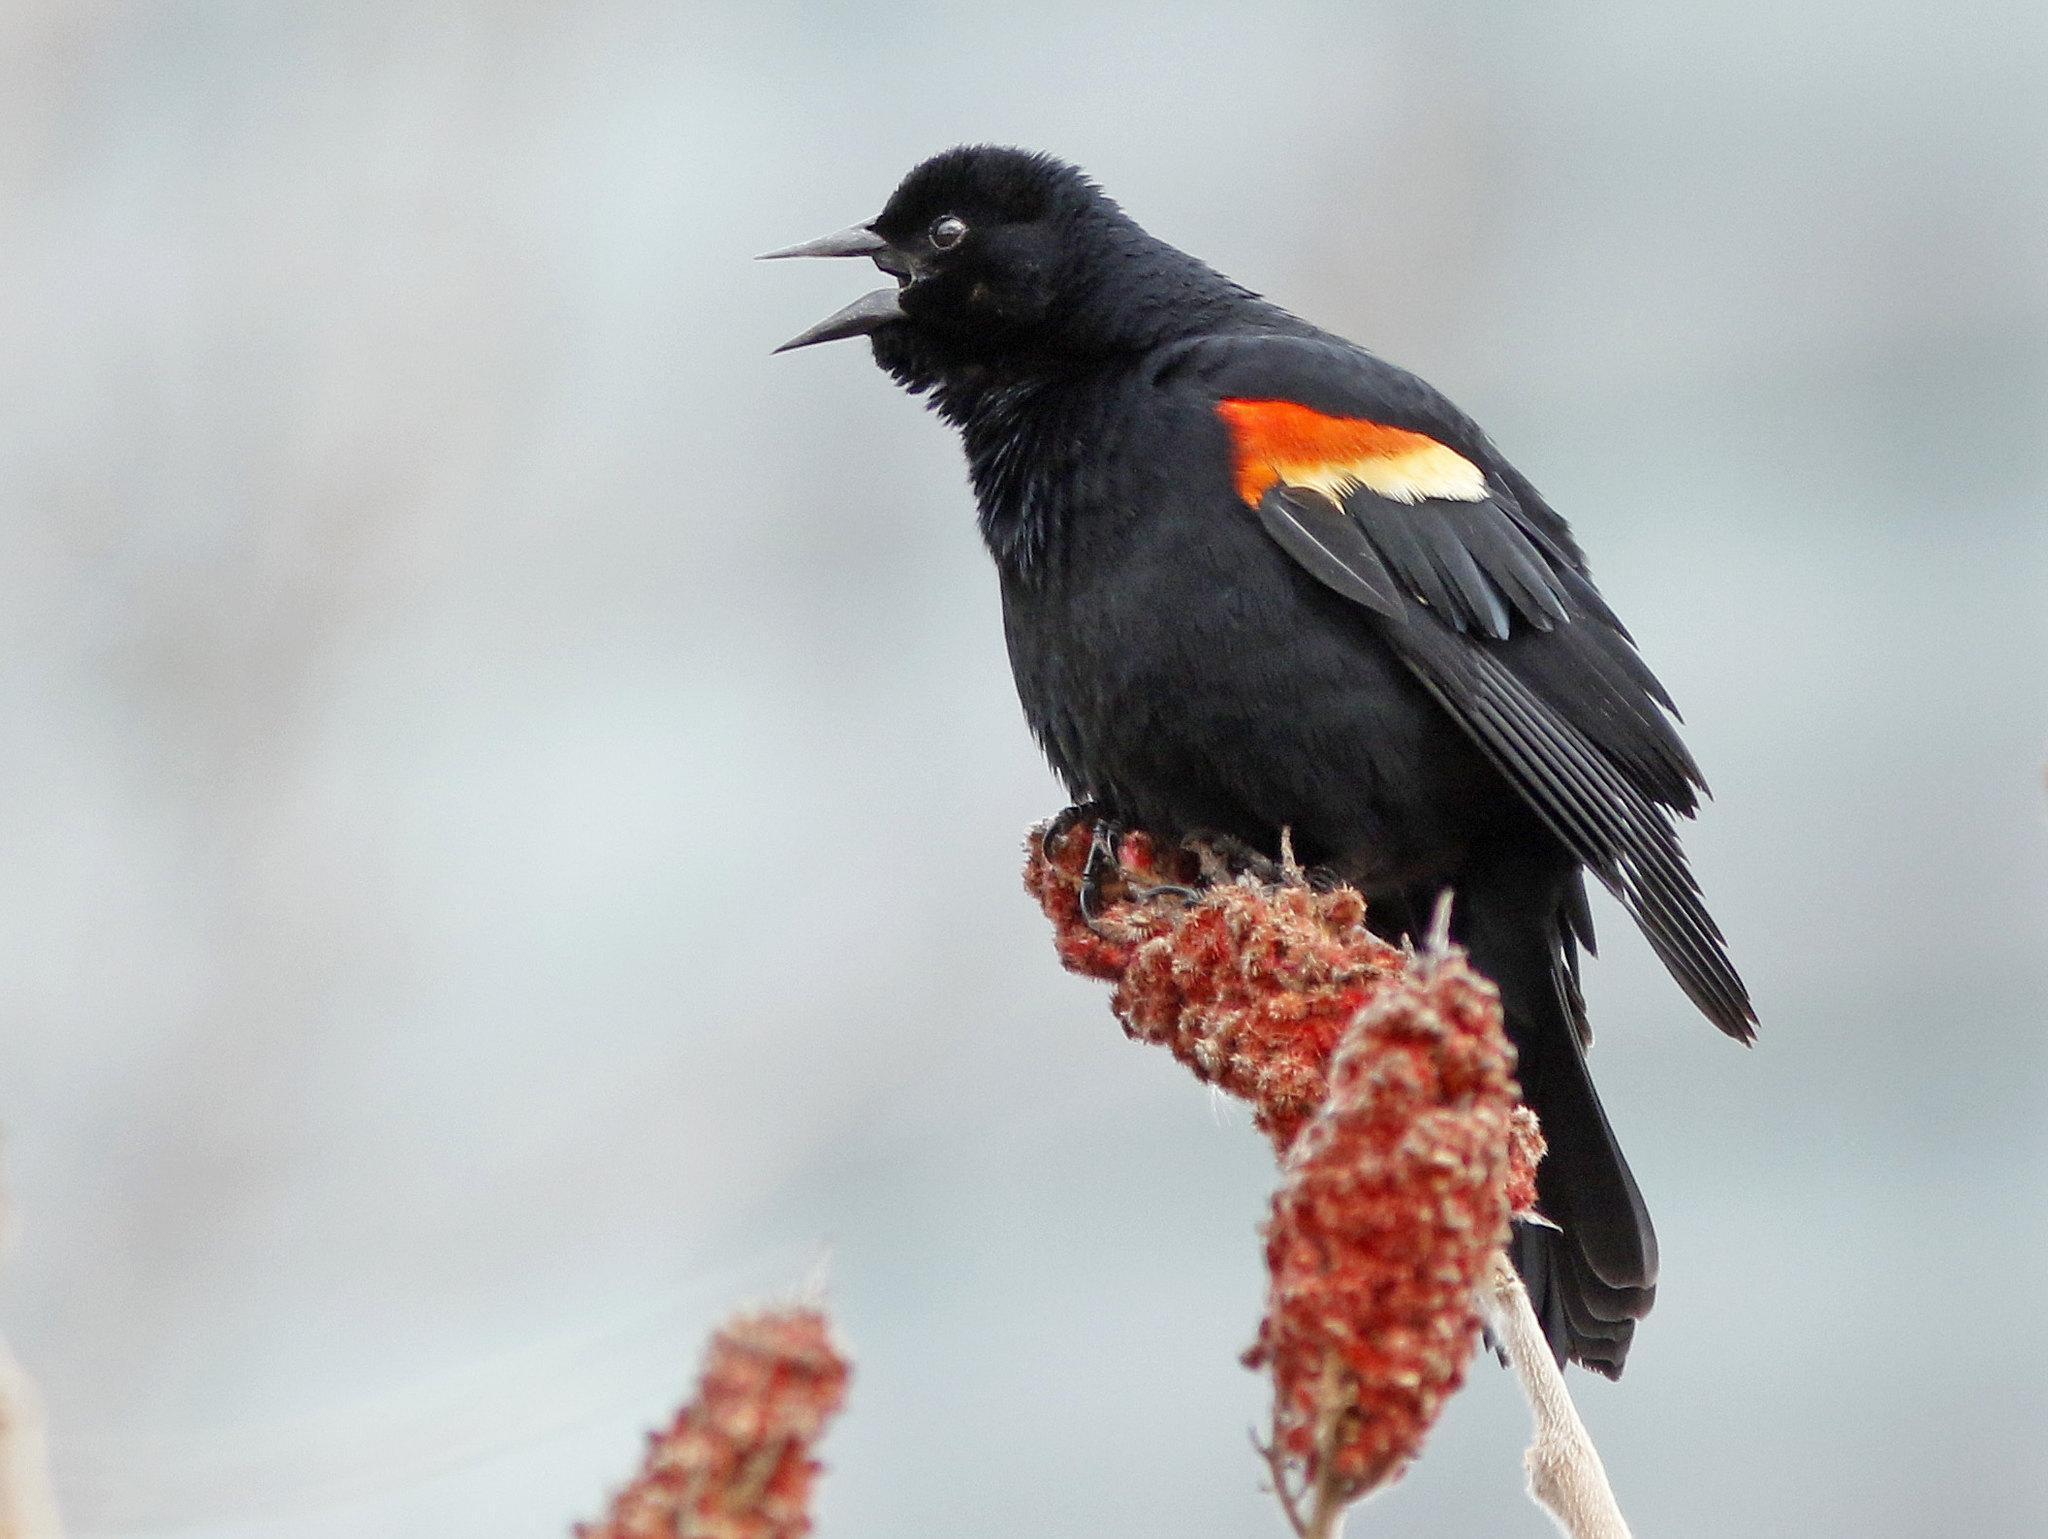 Red-winged Blackbird male. Photo: David Beadle